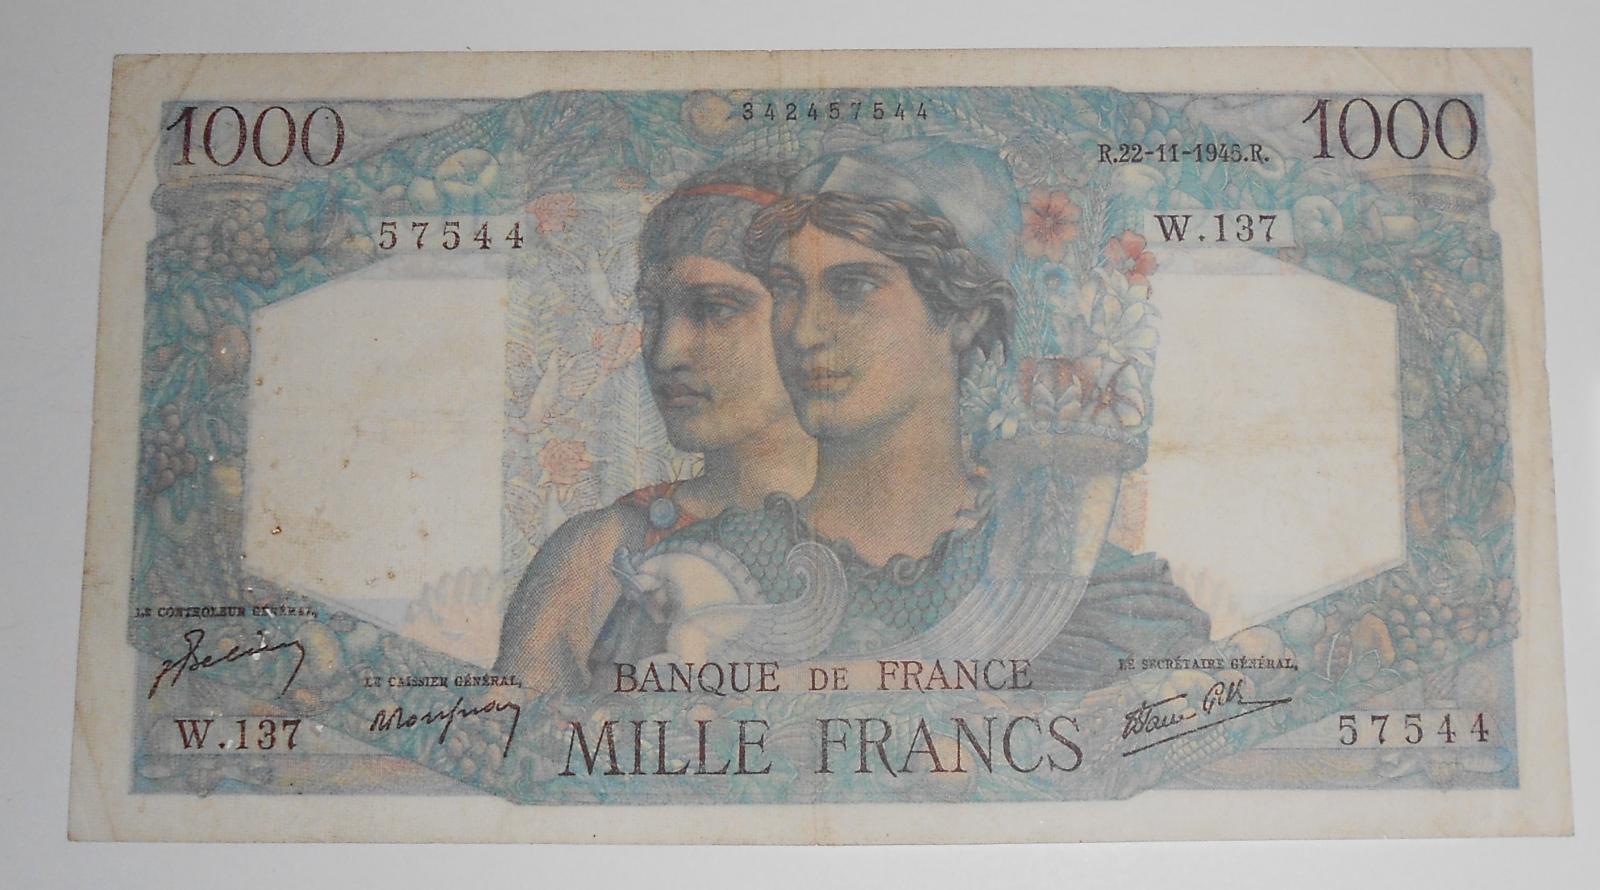 Francie 1000 Frank 1945